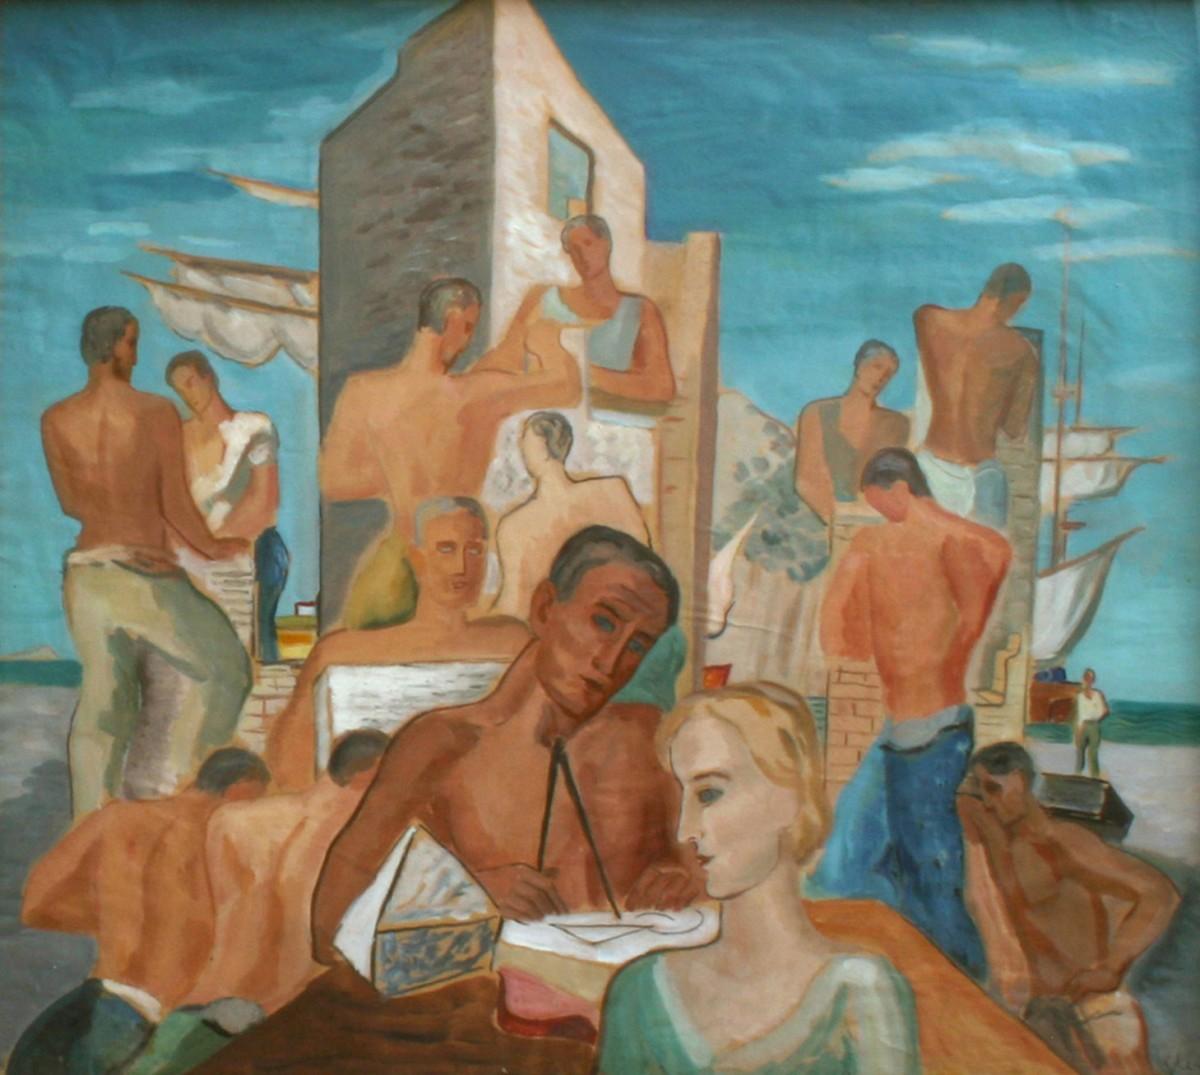 Gerasimos Steris, Work, oil on canvas. Municipal Gallery of Athens.